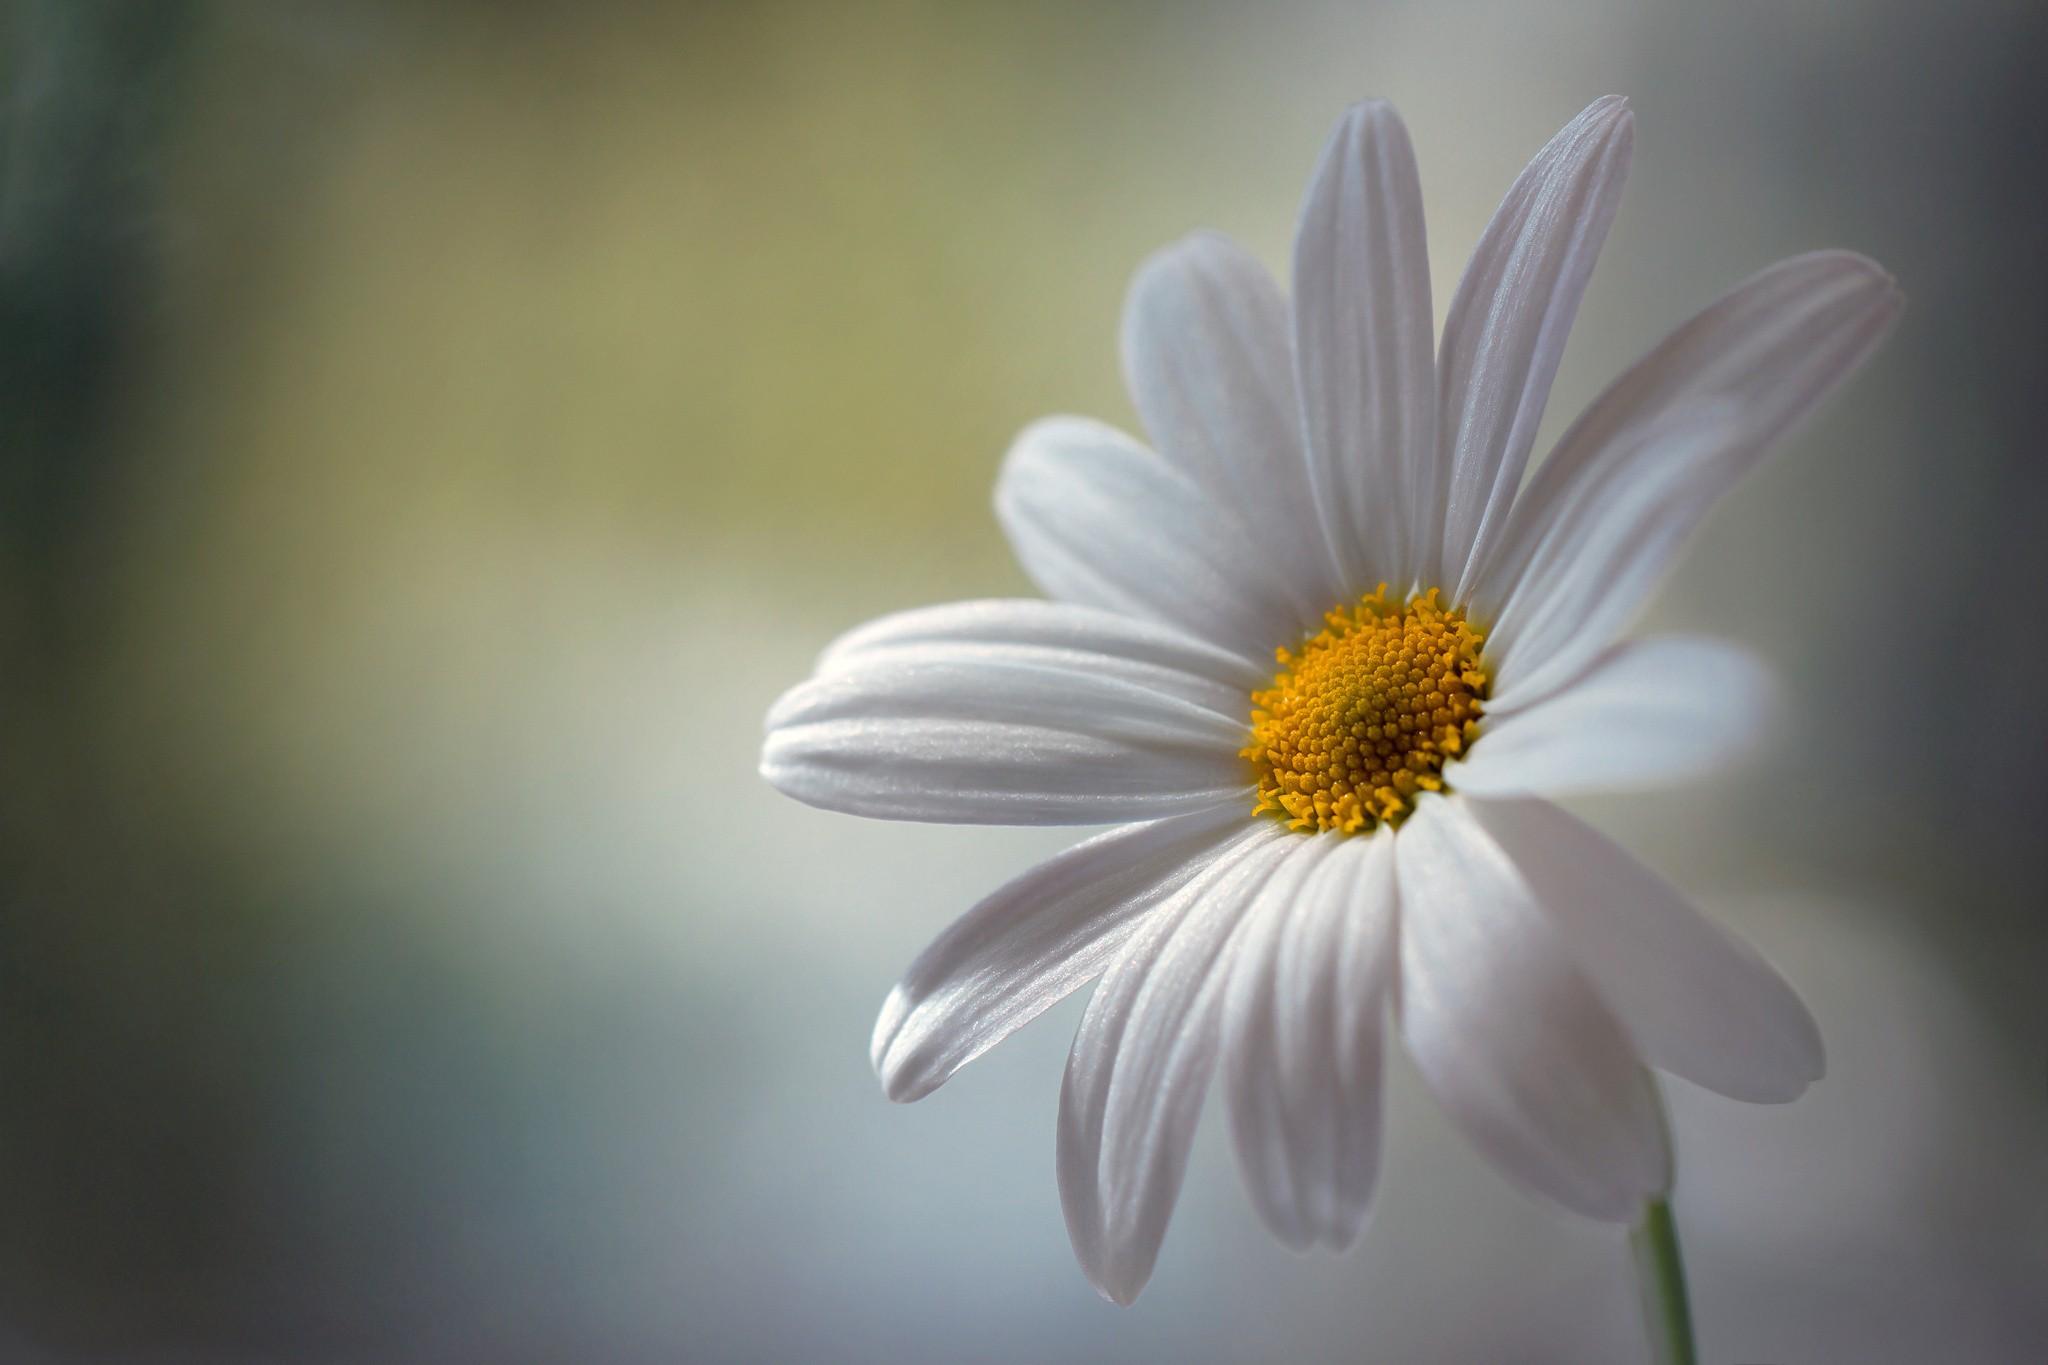 hinh anh hoa cuc dep 39